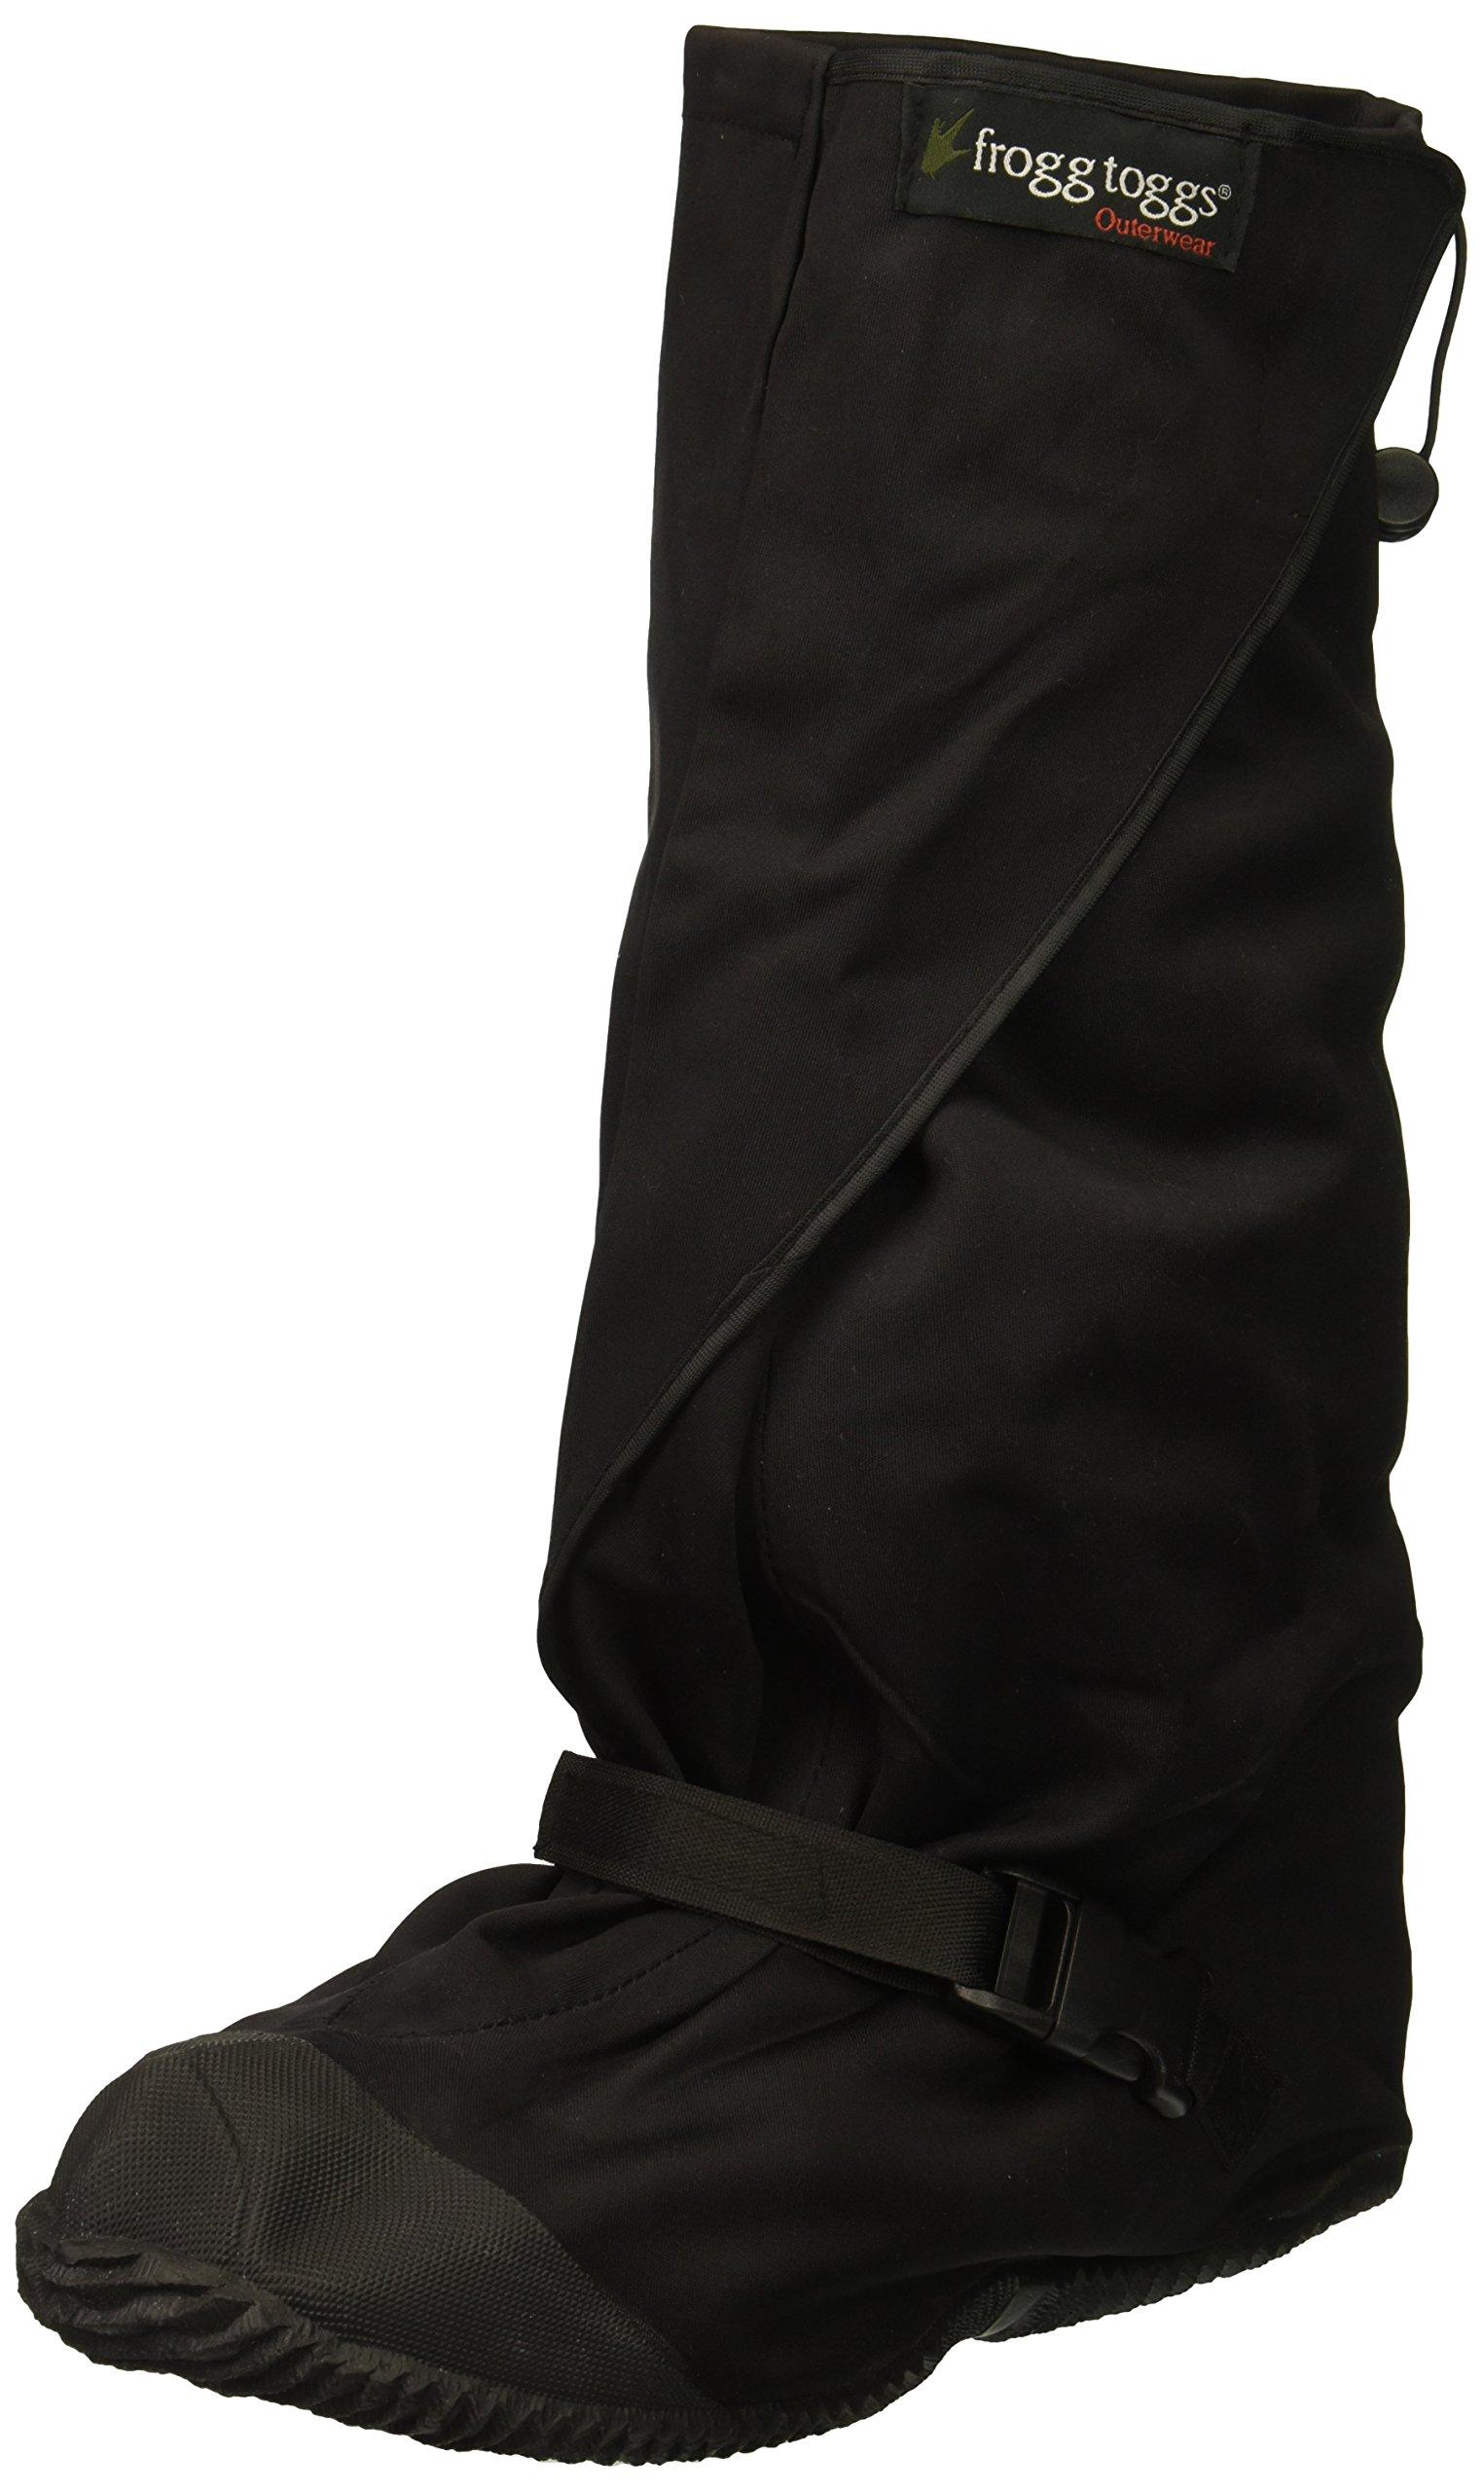 Frogg Toggs Unisex-Adult Frogg Leggs Over-Boot Leggings (Black, Small/Medium)